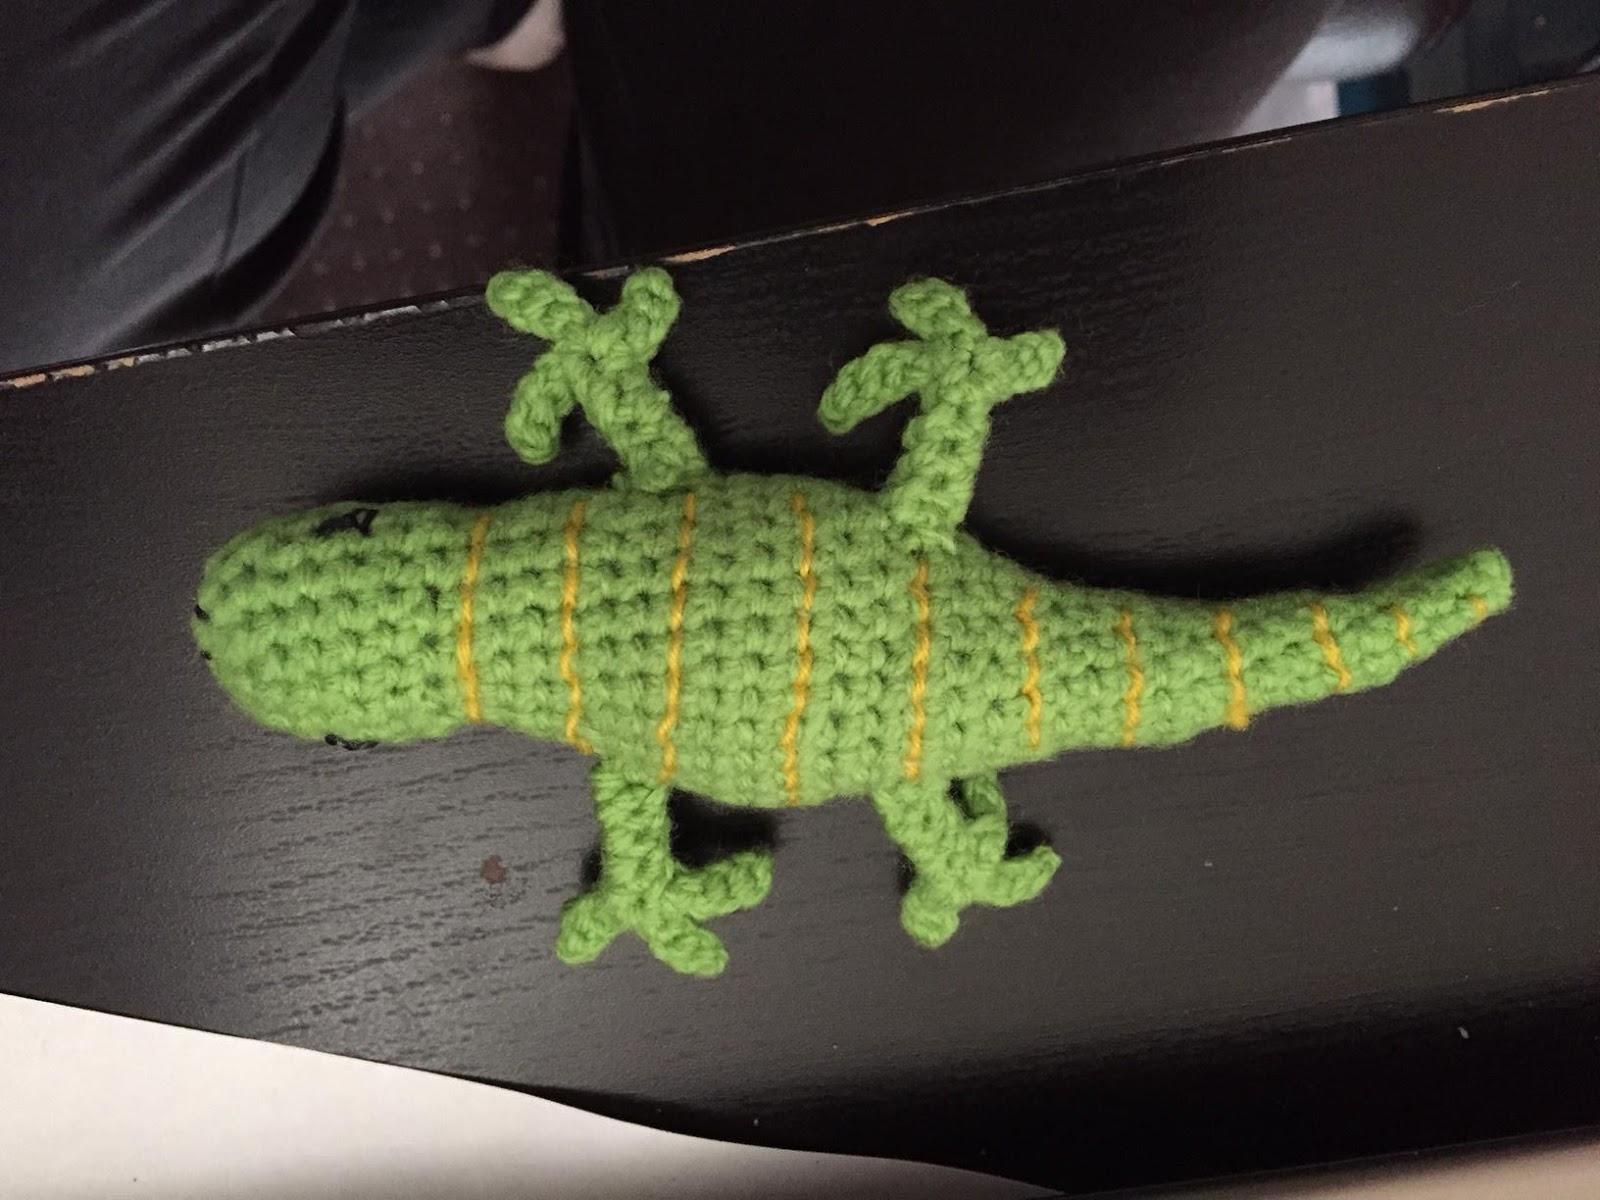 The crochet solution